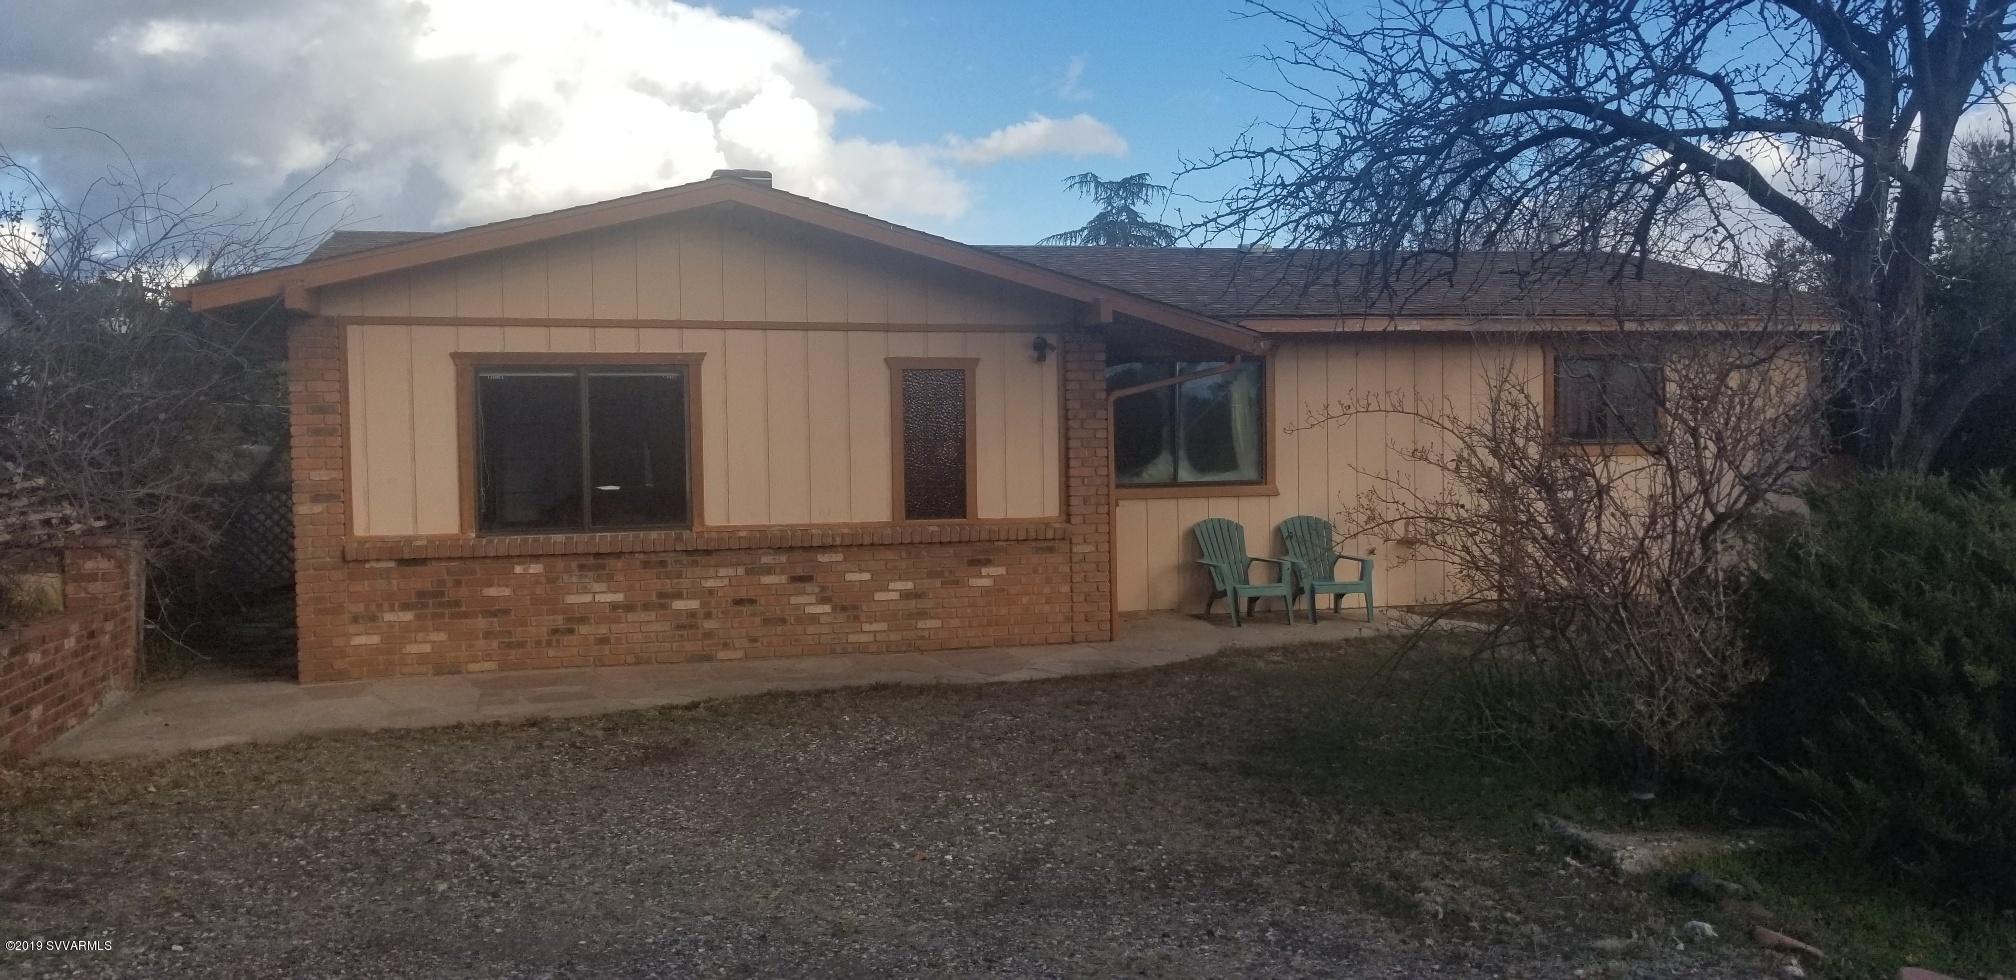 100 Farmer Brothers Drive Sedona, AZ 86336